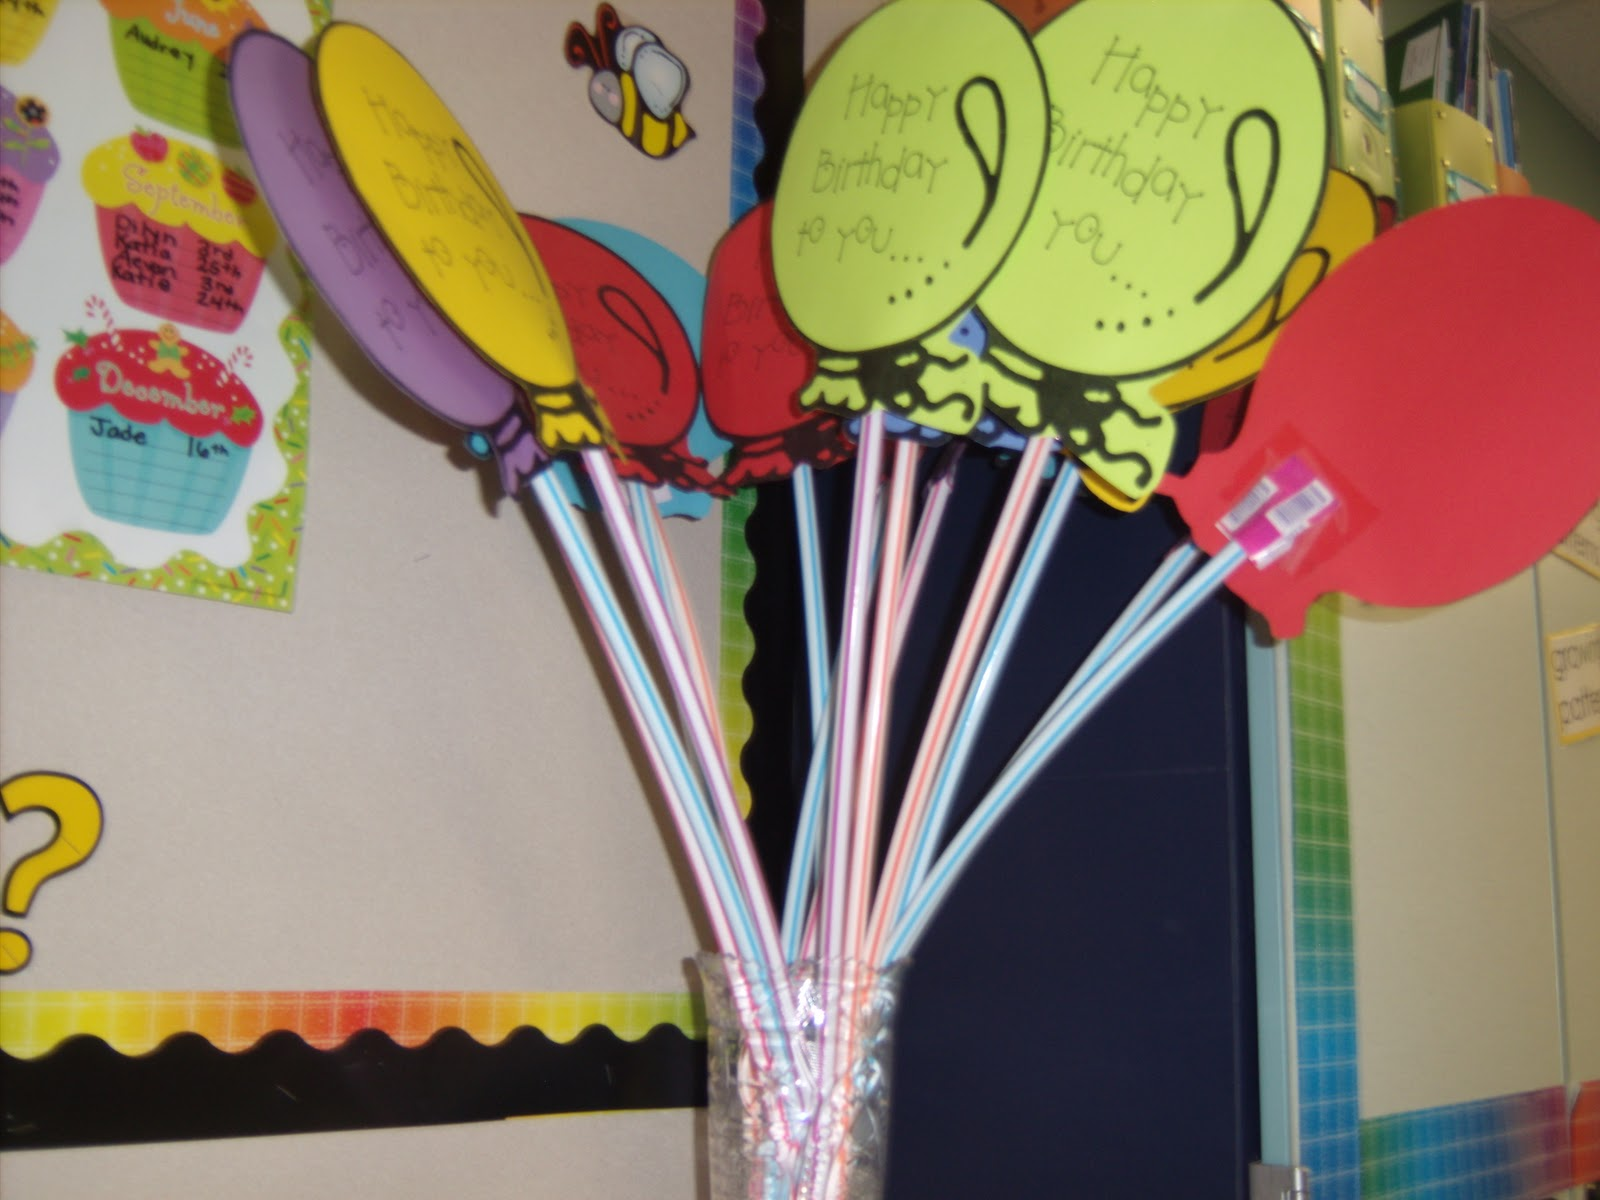 Birthday Cards For Teachers Ideas ~ Mrs. freshwater's class: happy happy birthday baby